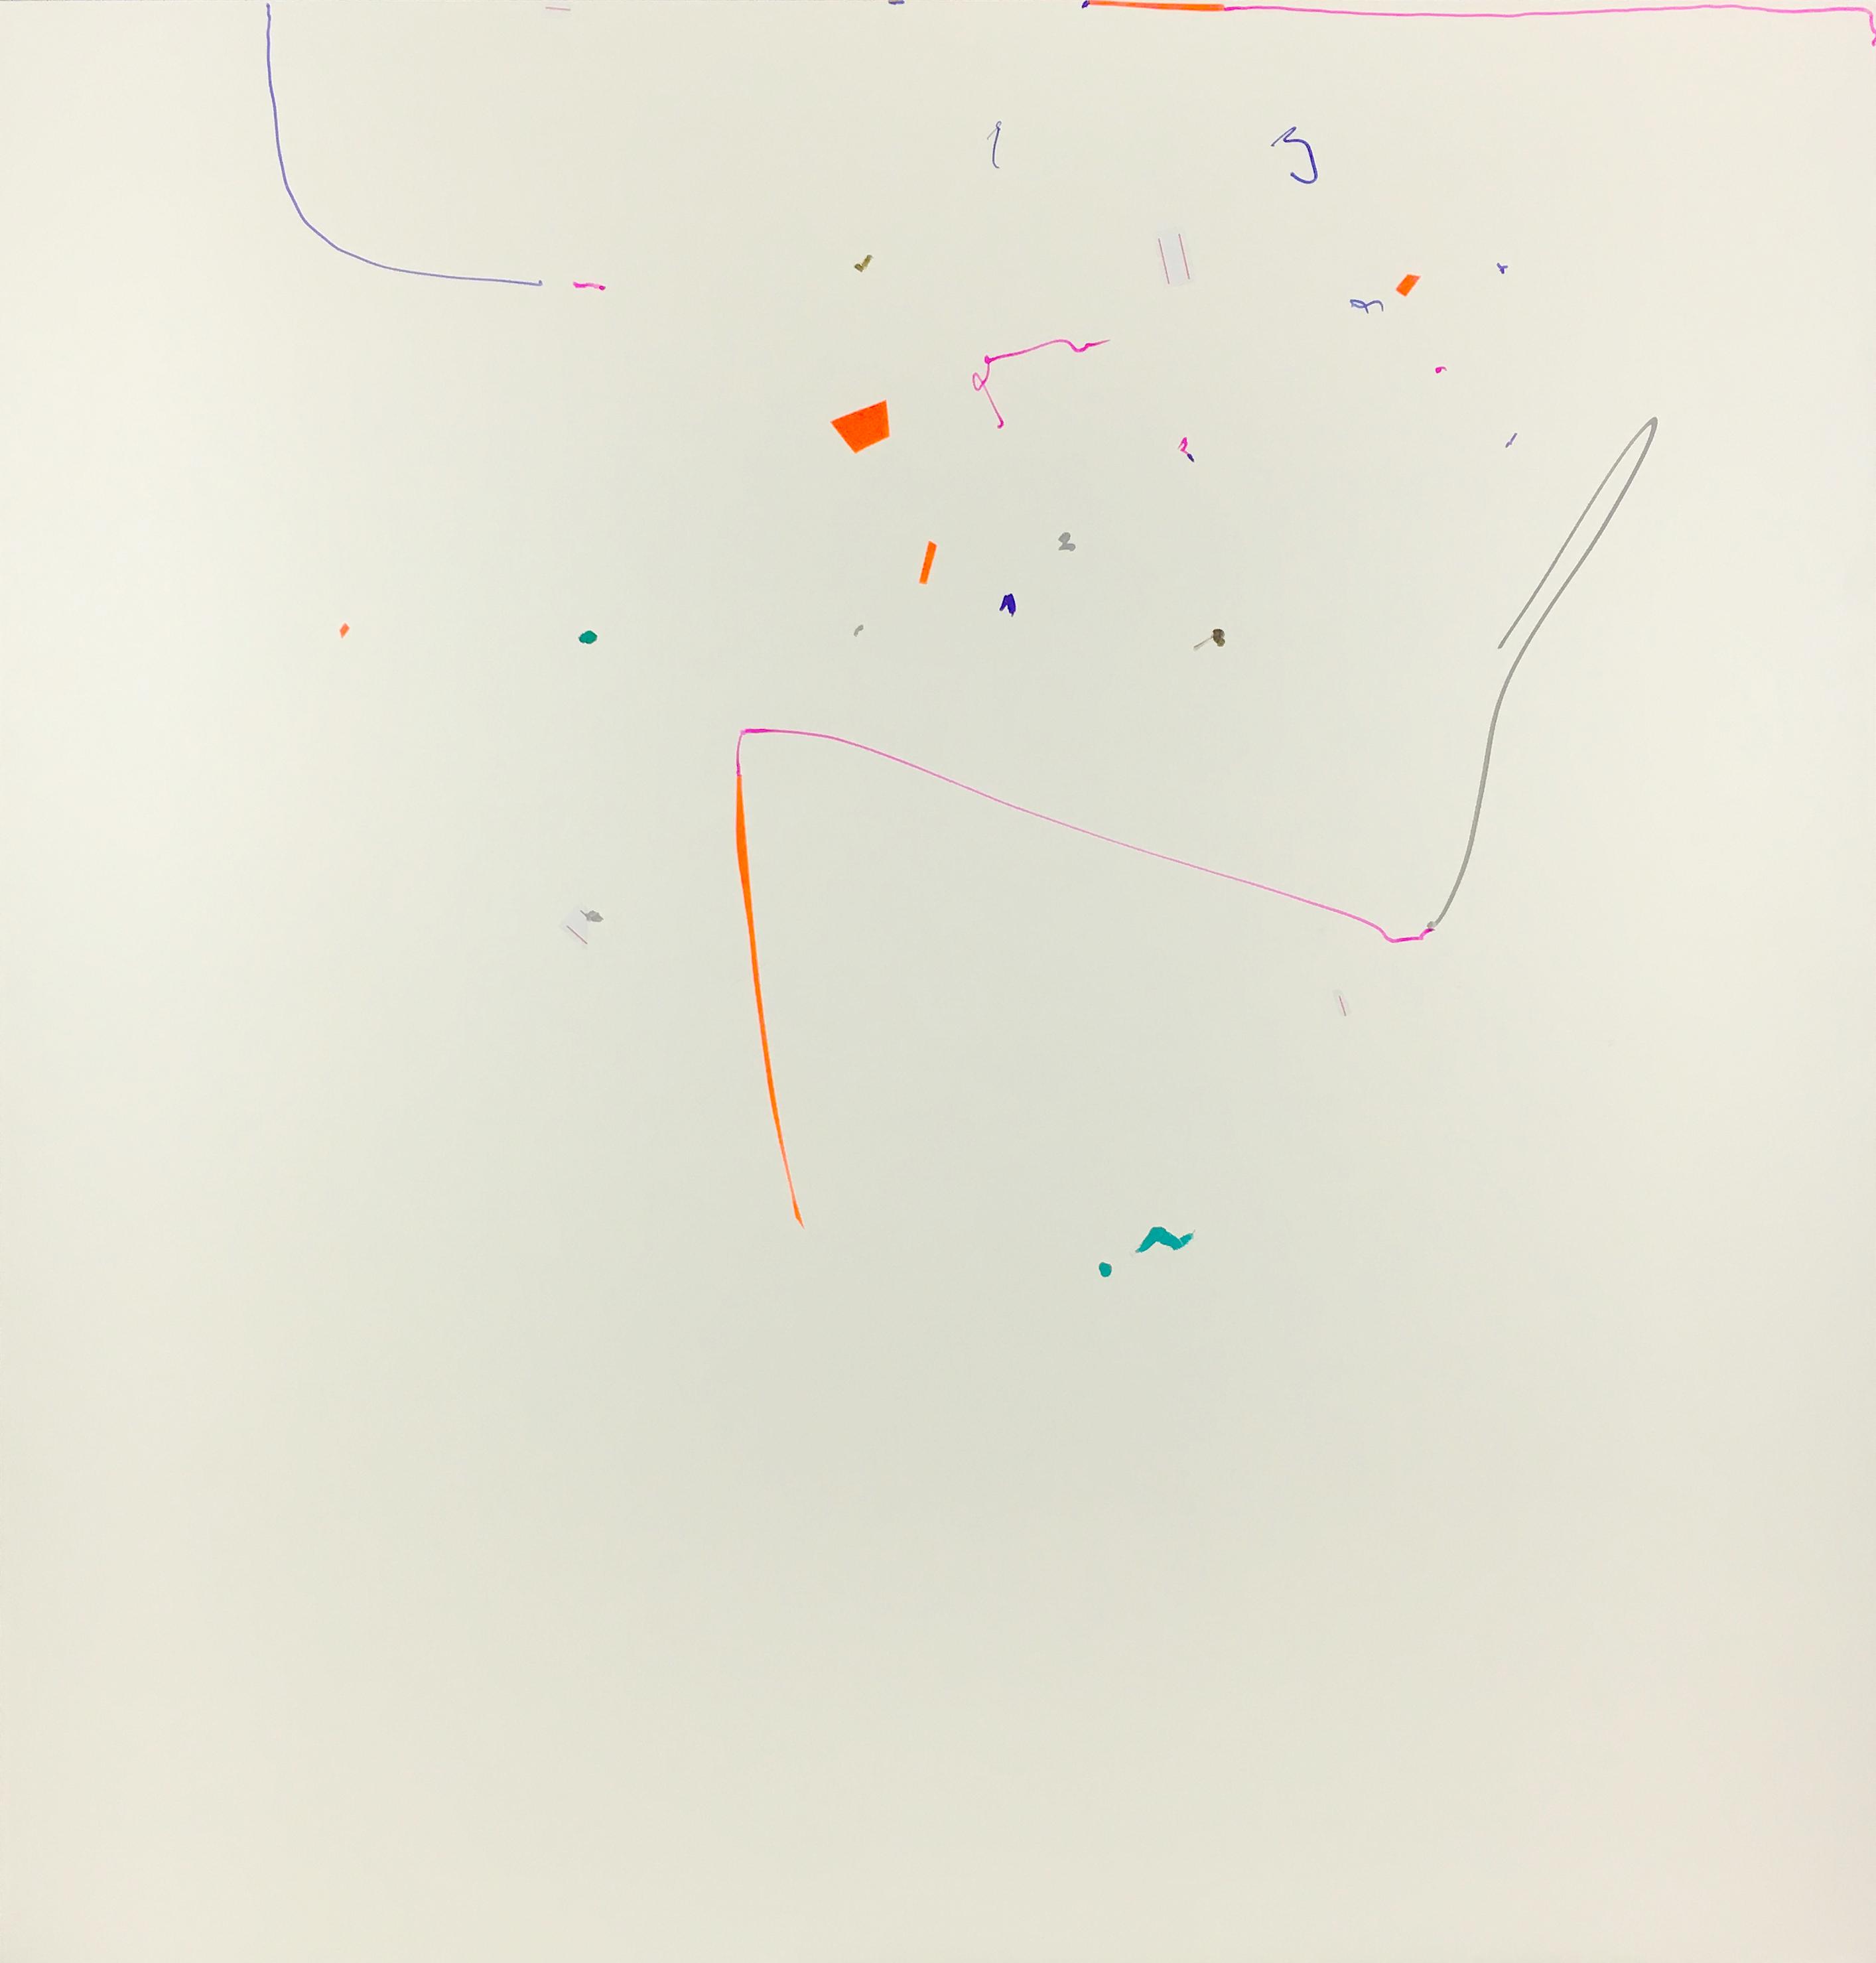 Melancholiker Oleksiy Koval, 2016 73 x 70 cm, marker, tape on FPY